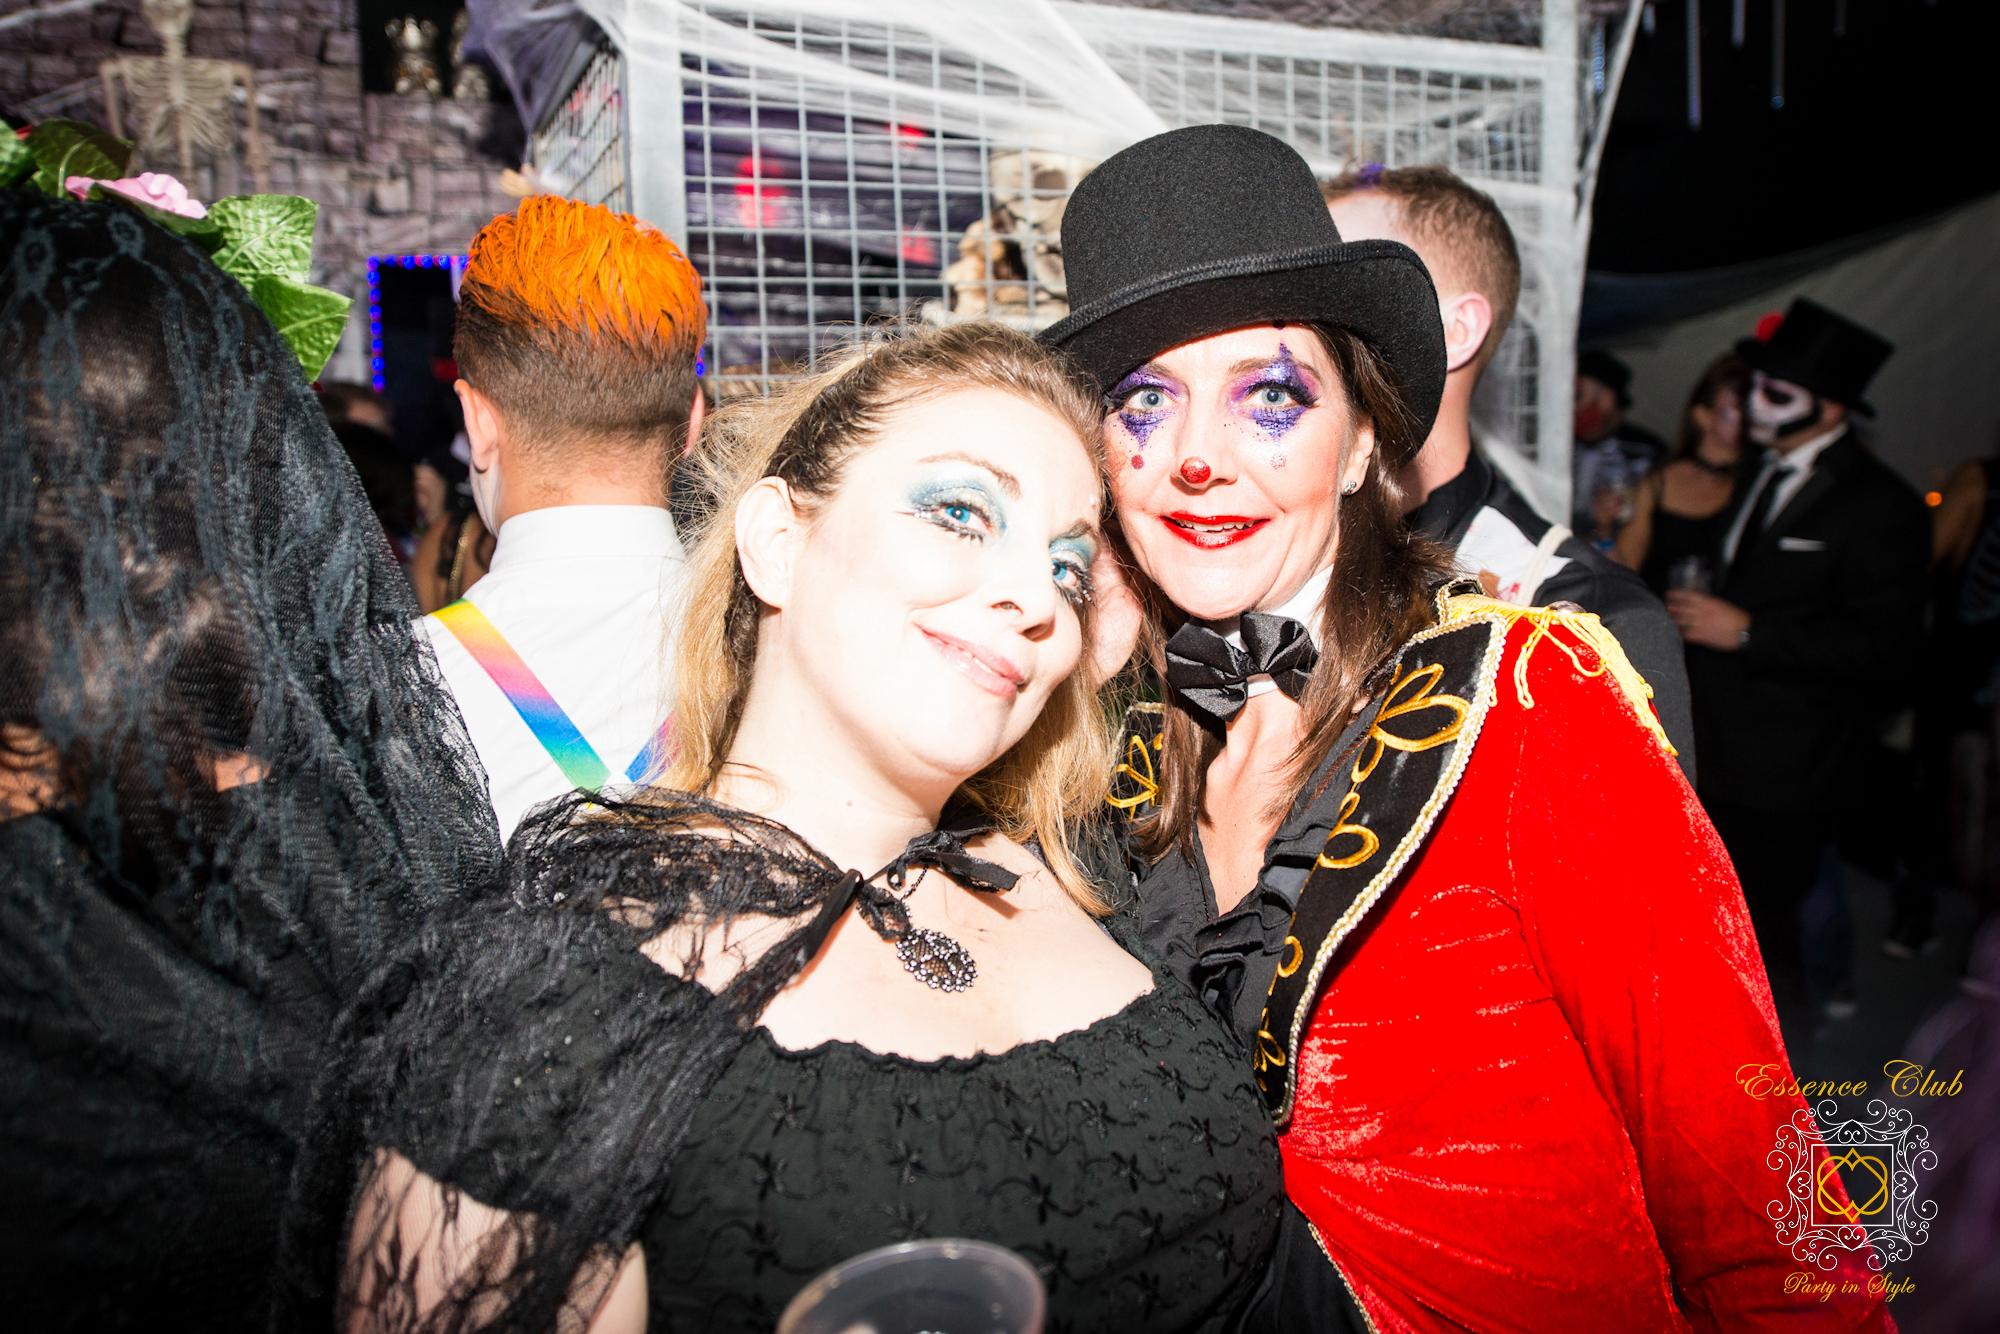 Halloween themed parties